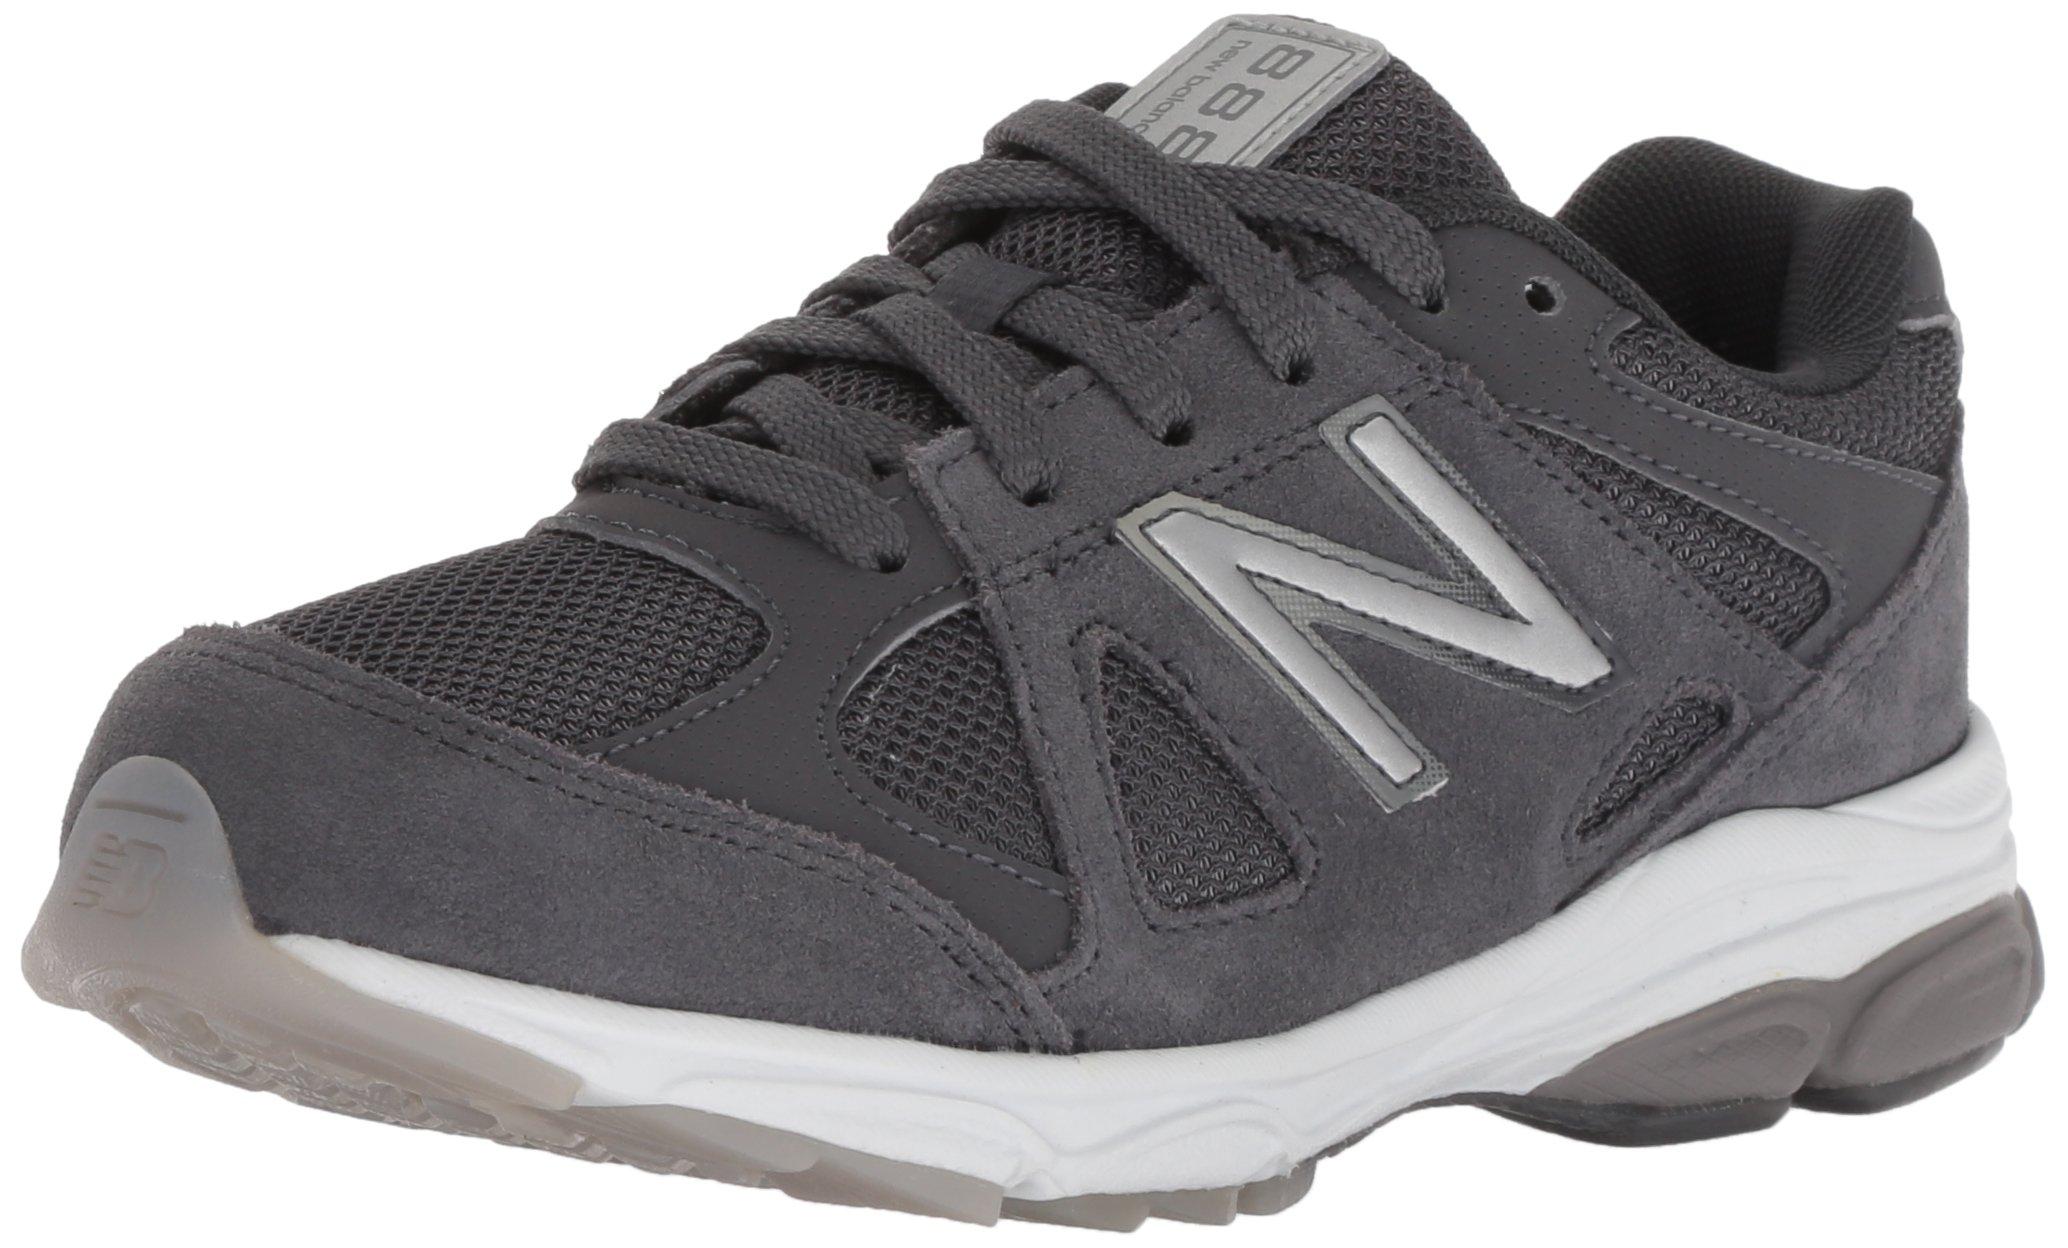 New Balance Boys' 888v1 Running Shoe, Magnet, 5 M US Big Kid